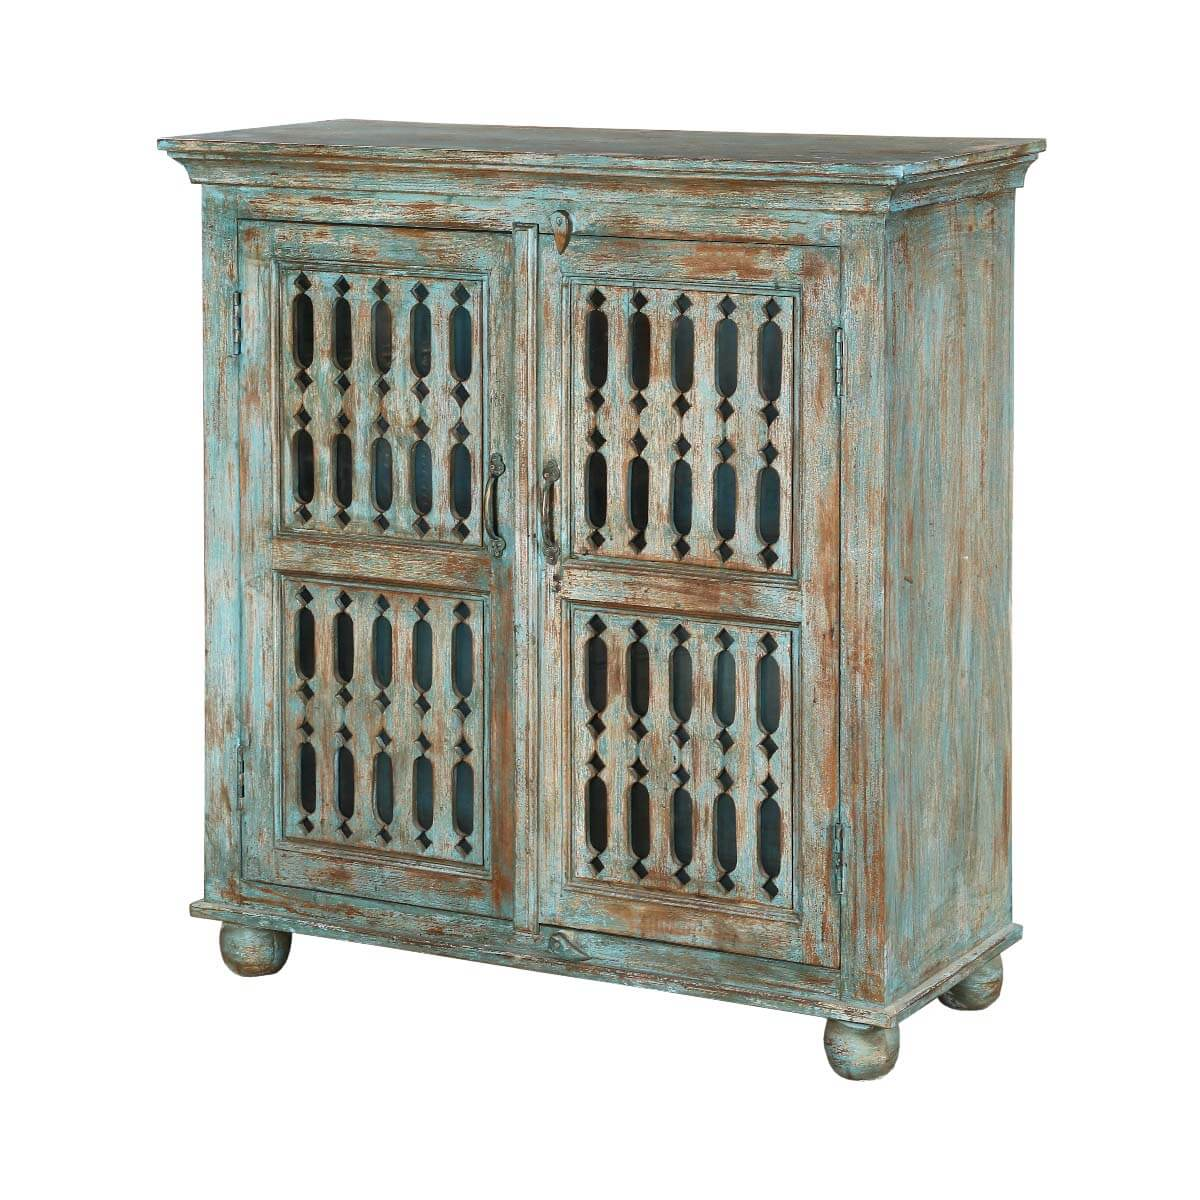 Rustic Spring Distressed Mango Wood Freestanding Storage Cabinet